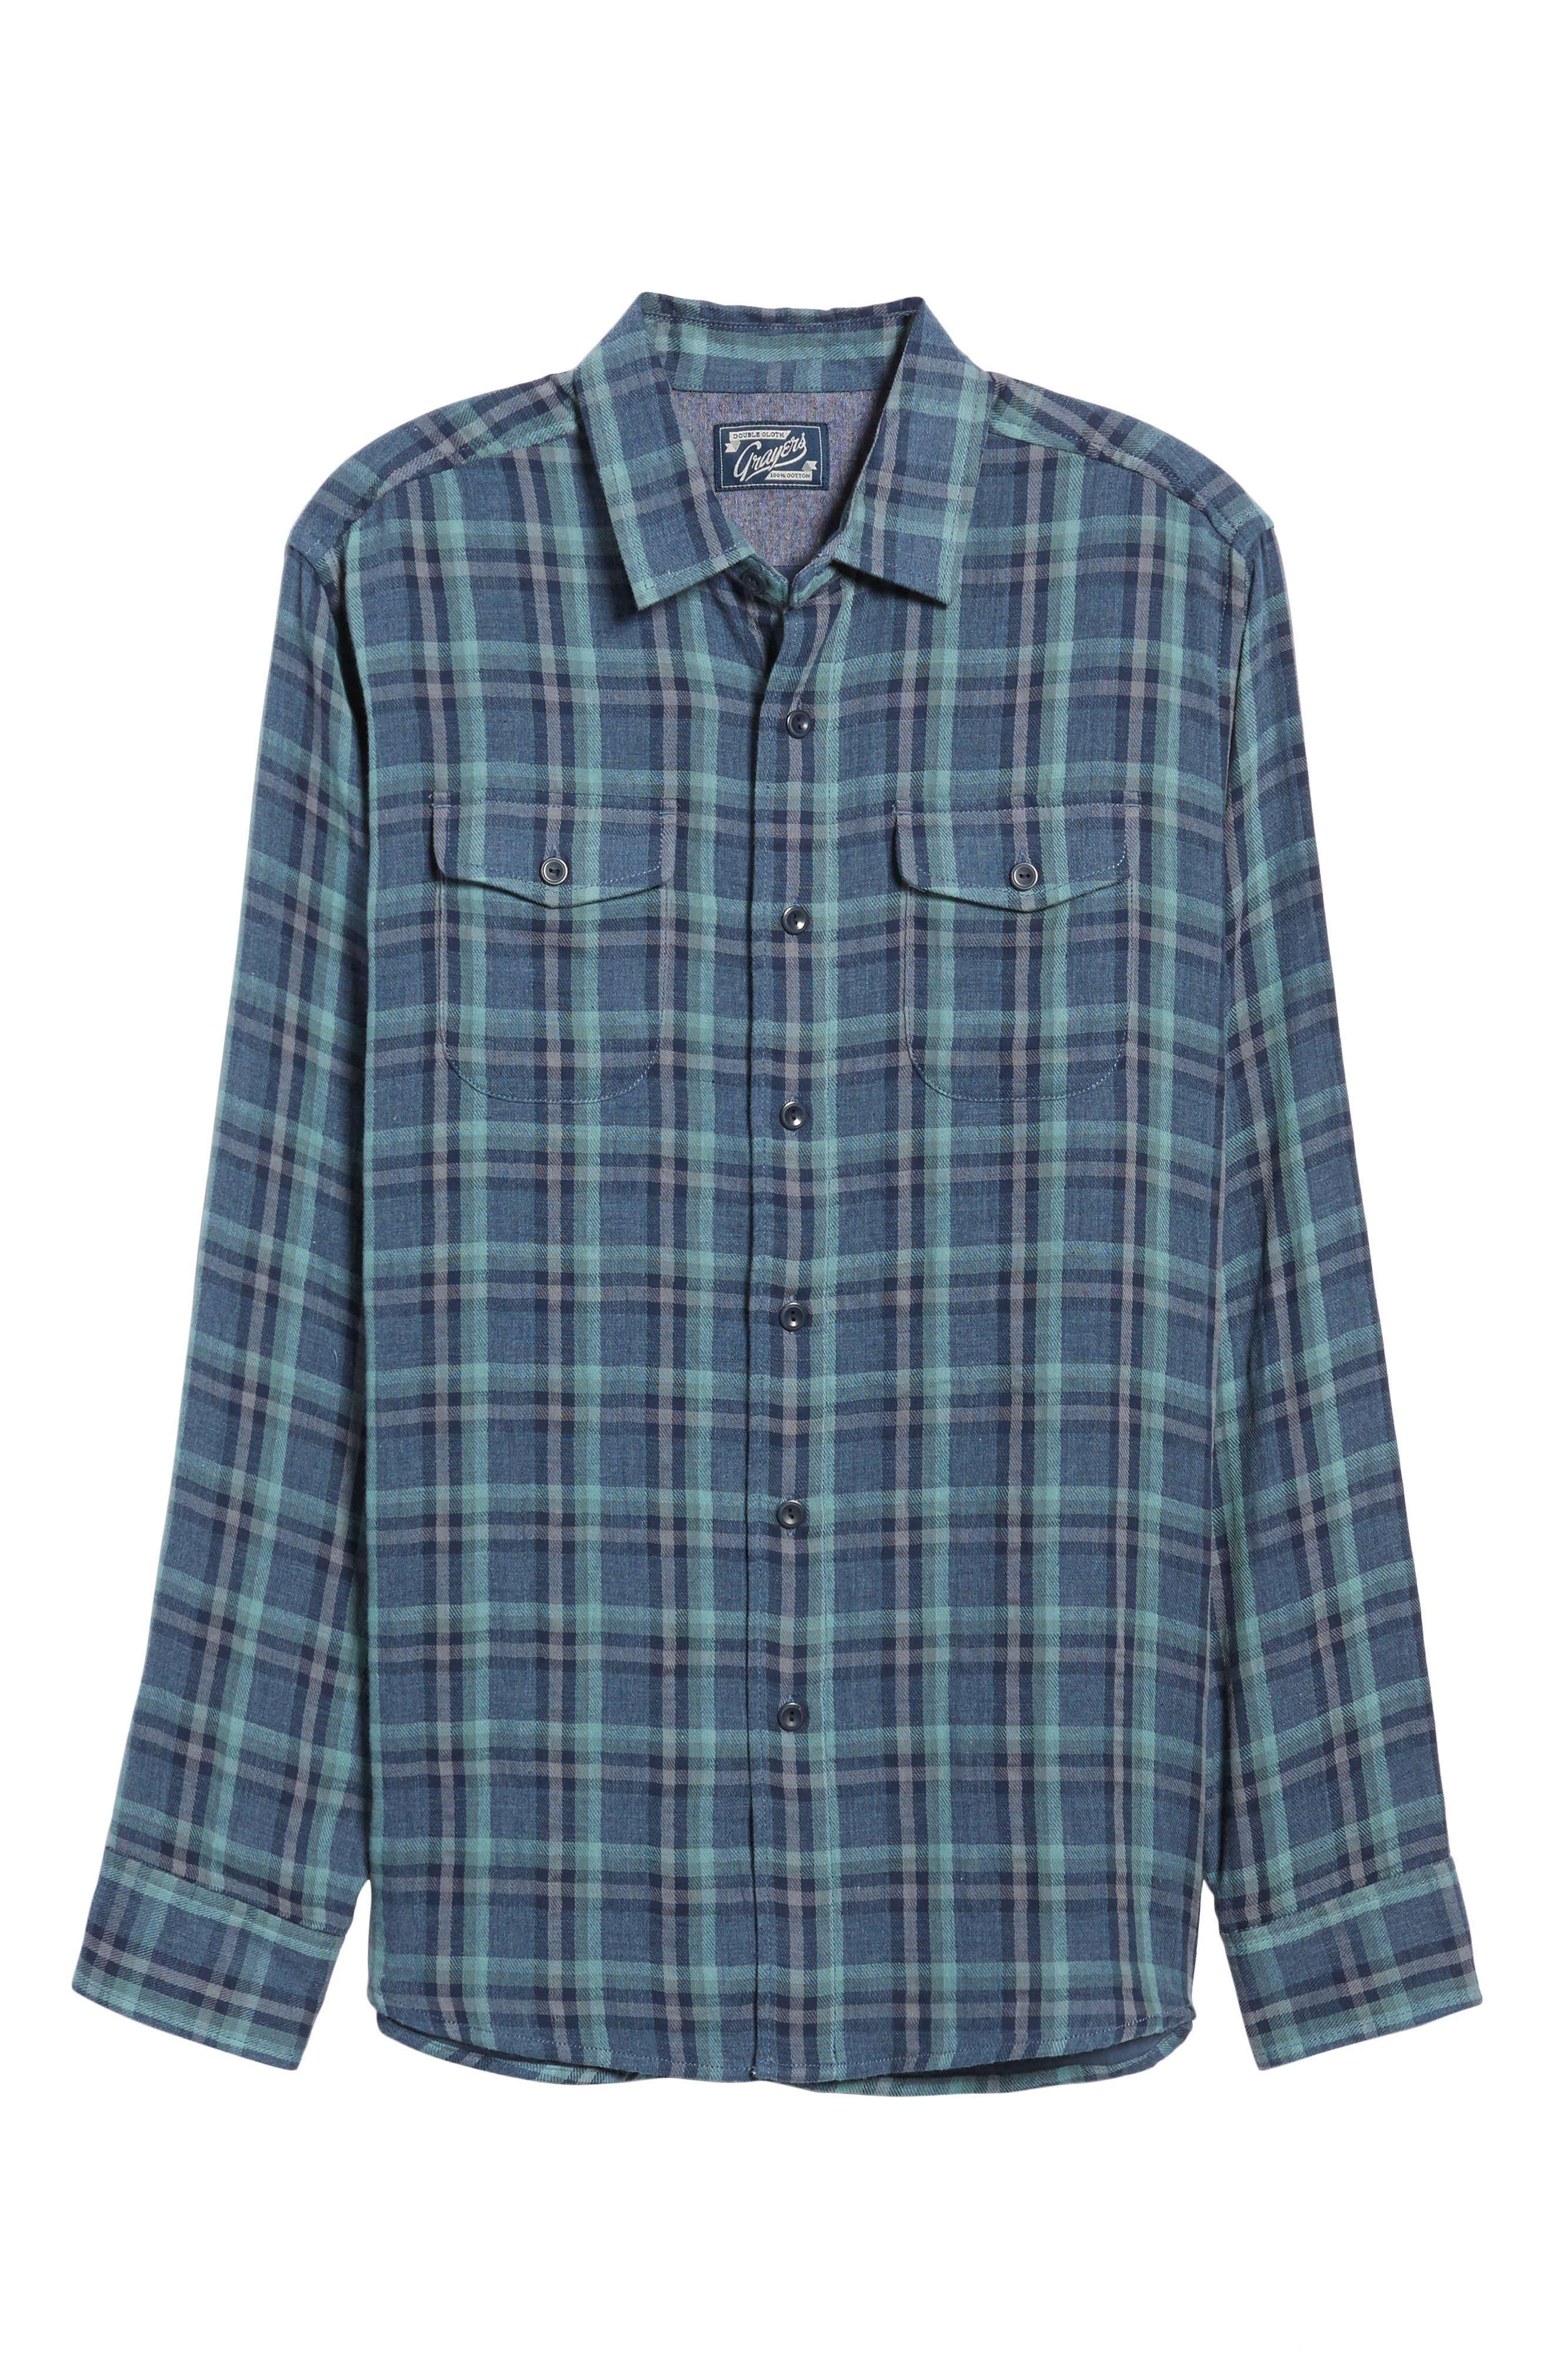 Smith Double Cloth Plaid Sport Shirt,                             Alternate thumbnail 6, color,                             460